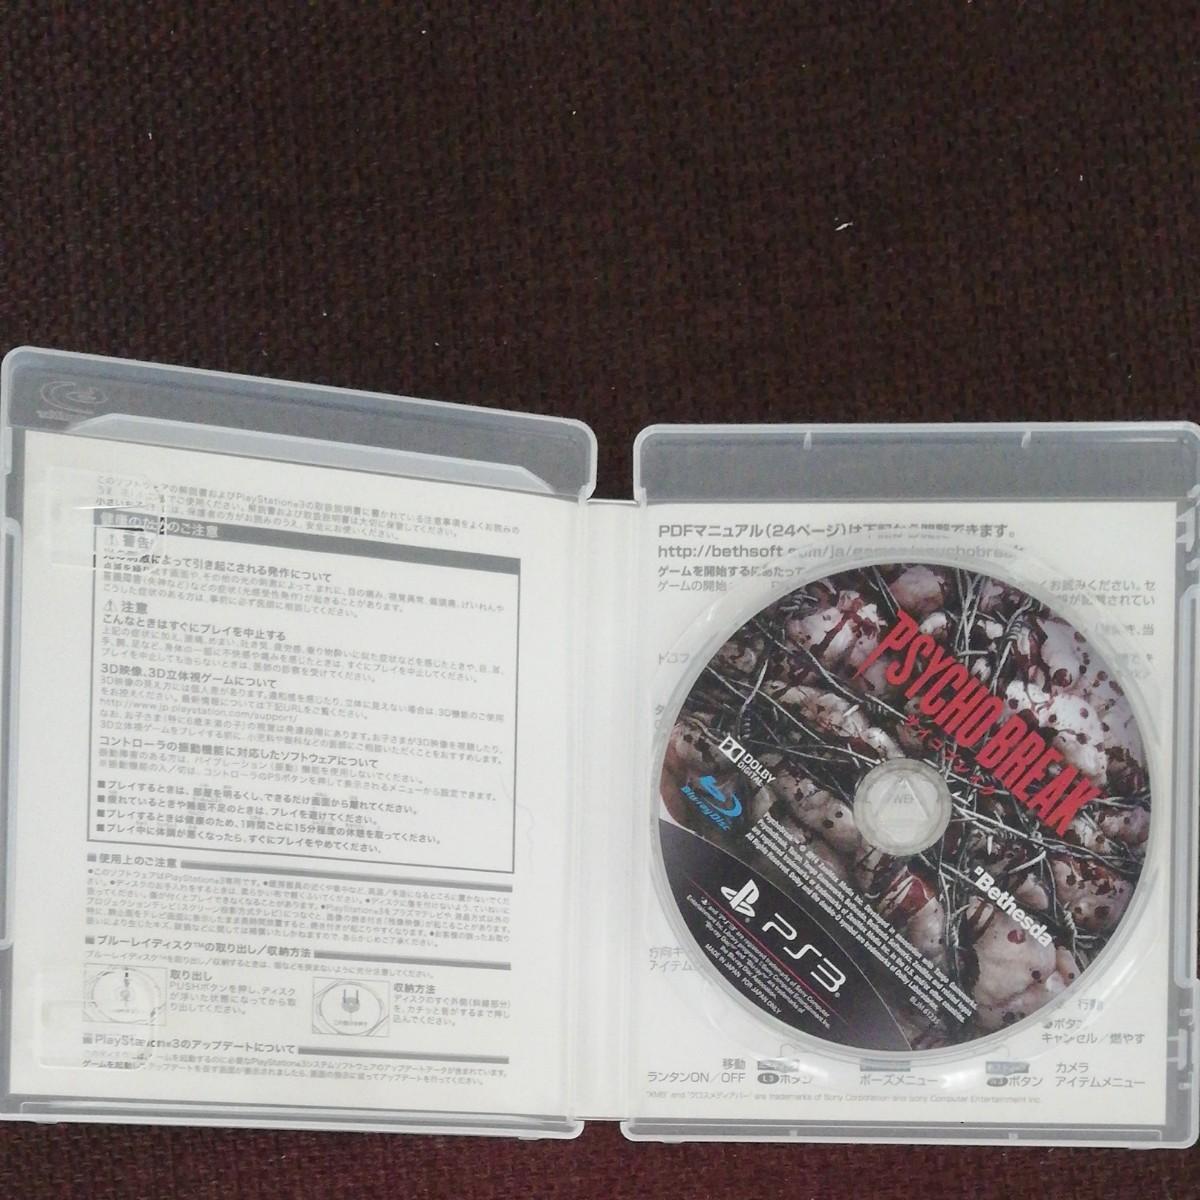 PS3ソフト サイコブレイク